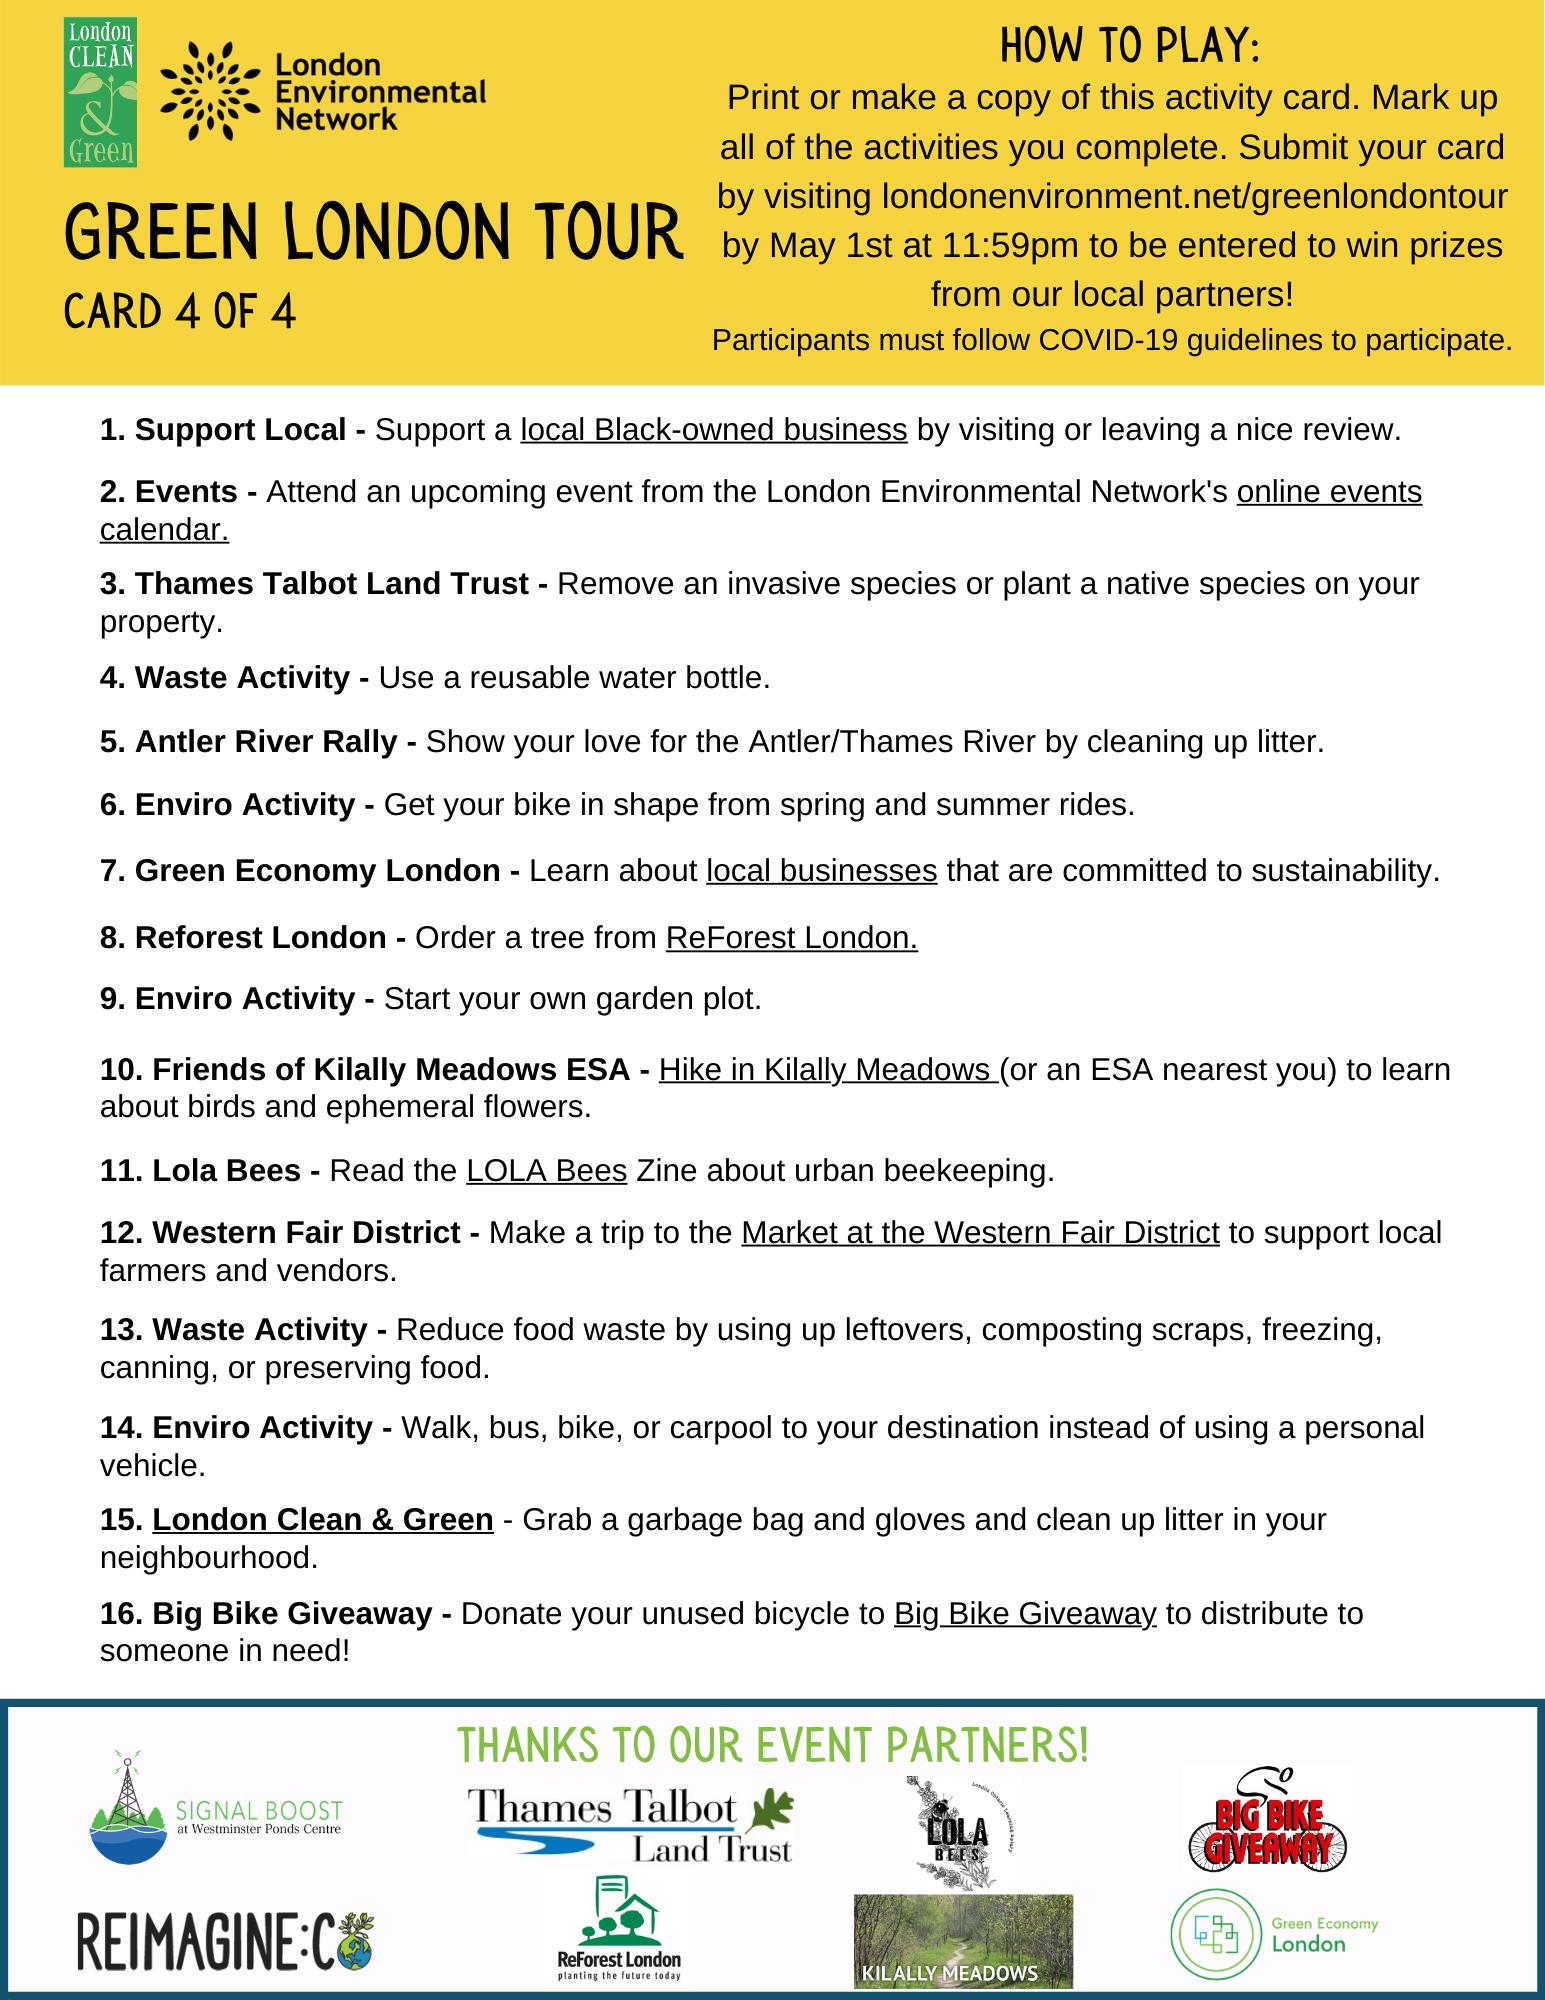 Green London Tour List 4